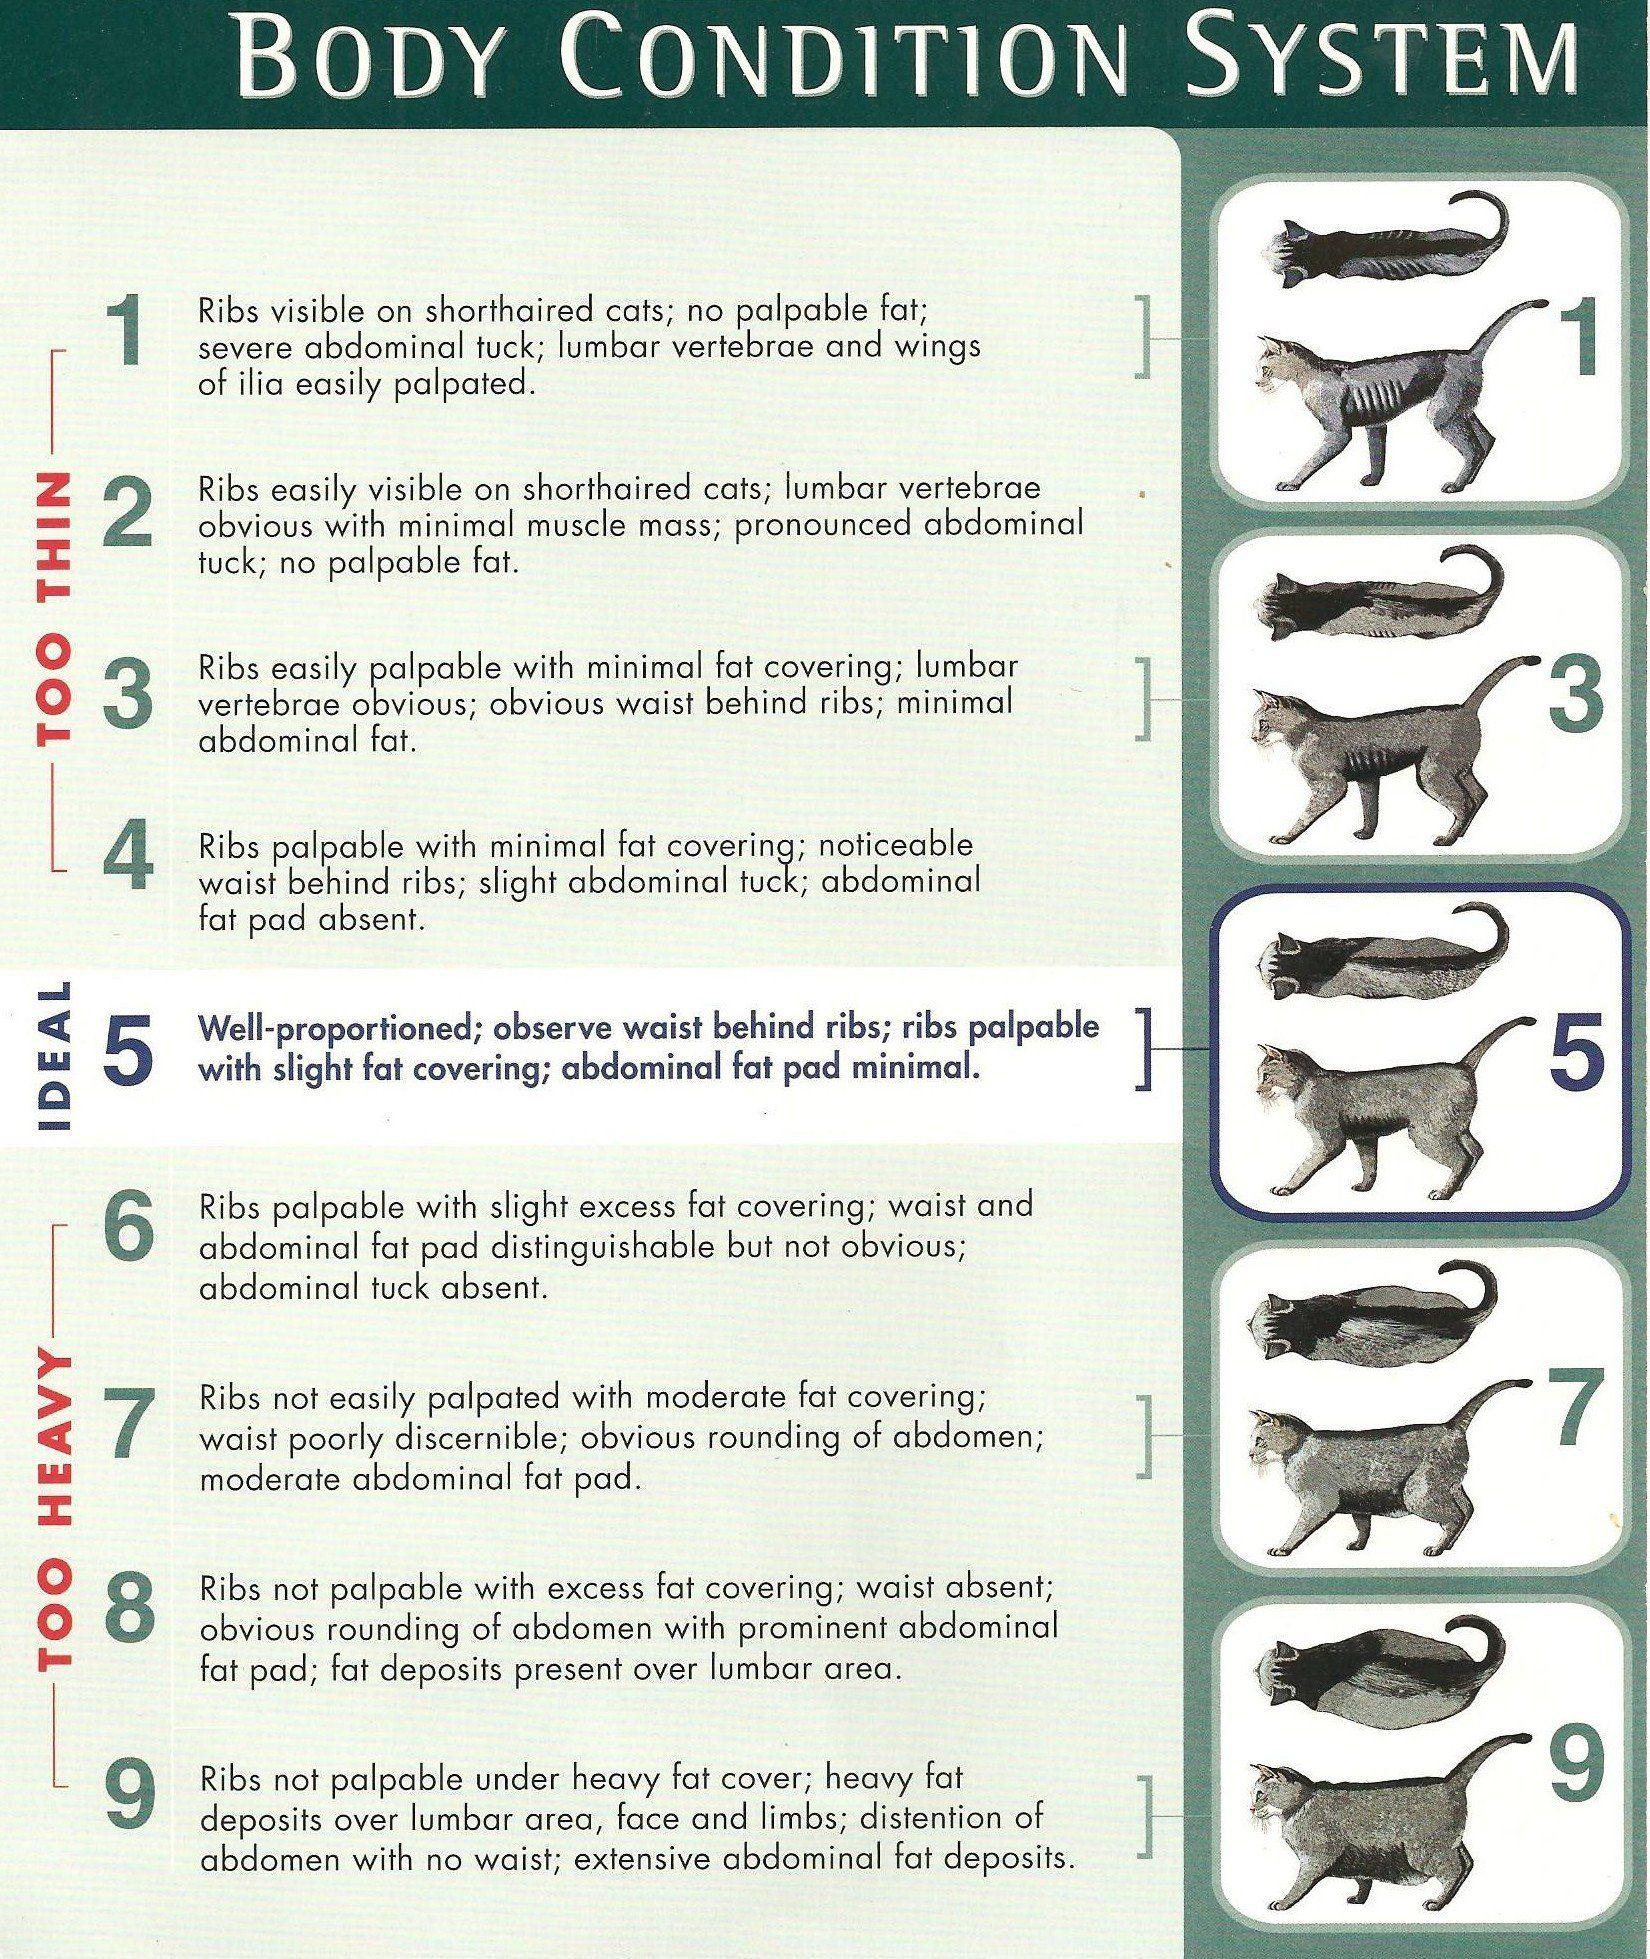 nestle purina cat body condition chart